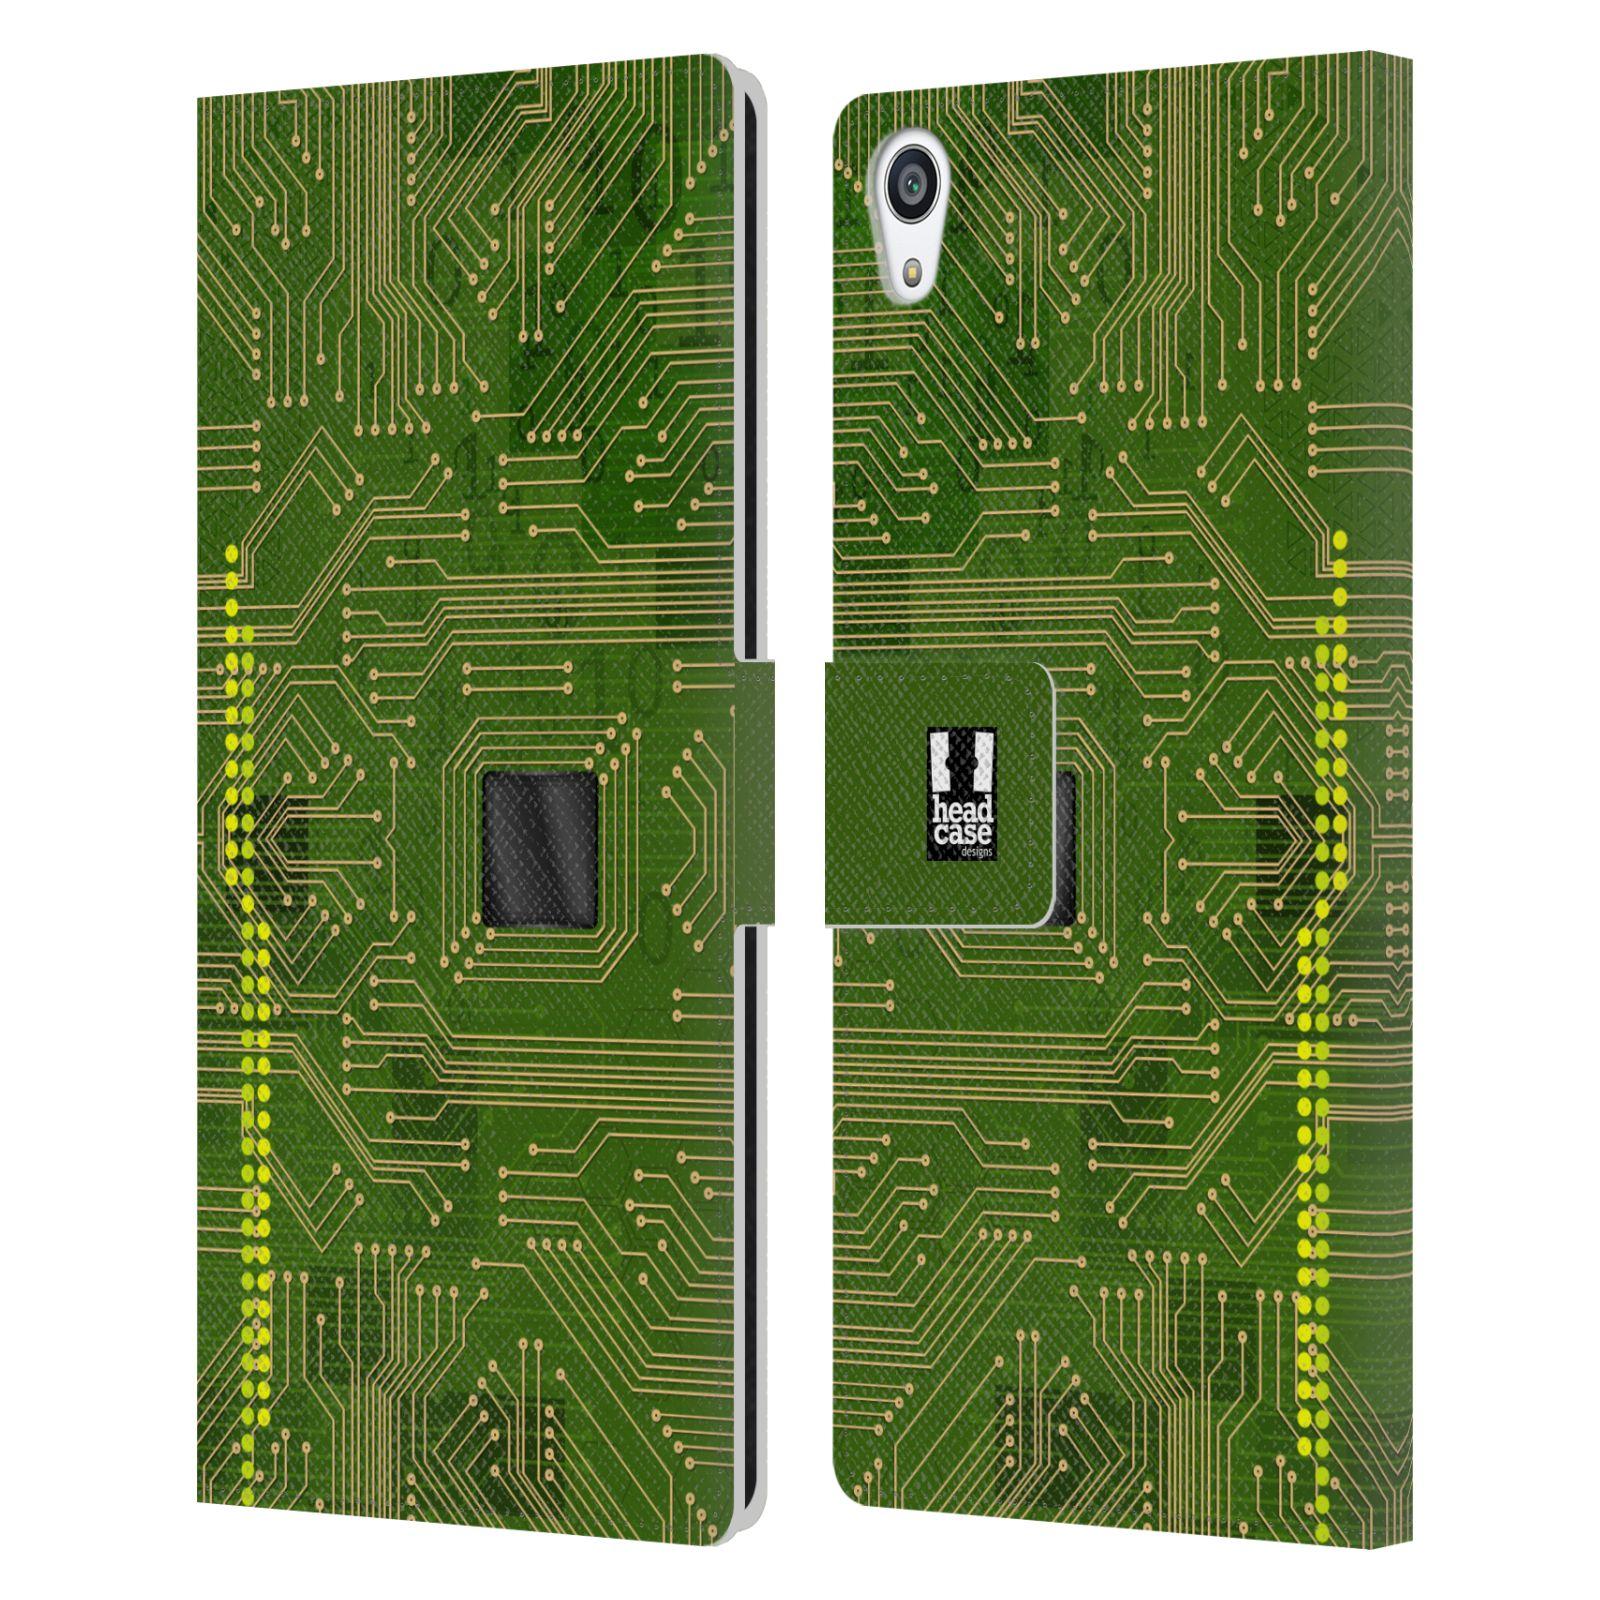 HEAD CASE Flipové pouzdro pro mobil SONY XPERIA Z5 PREMIUM počítač základní deska zelená barva